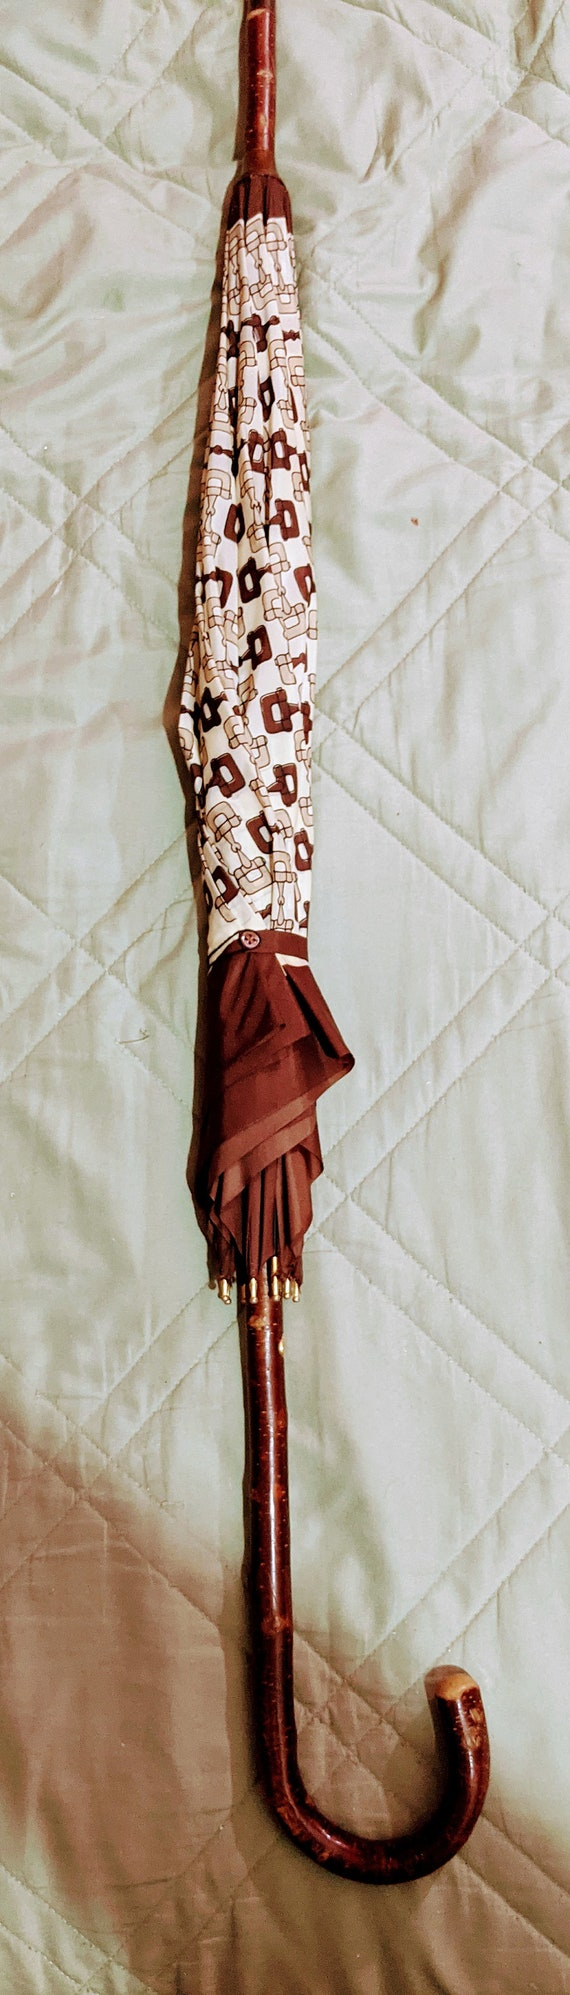 Vintage 1970's Authentic Gucci Horsebit Umbrella - image 1